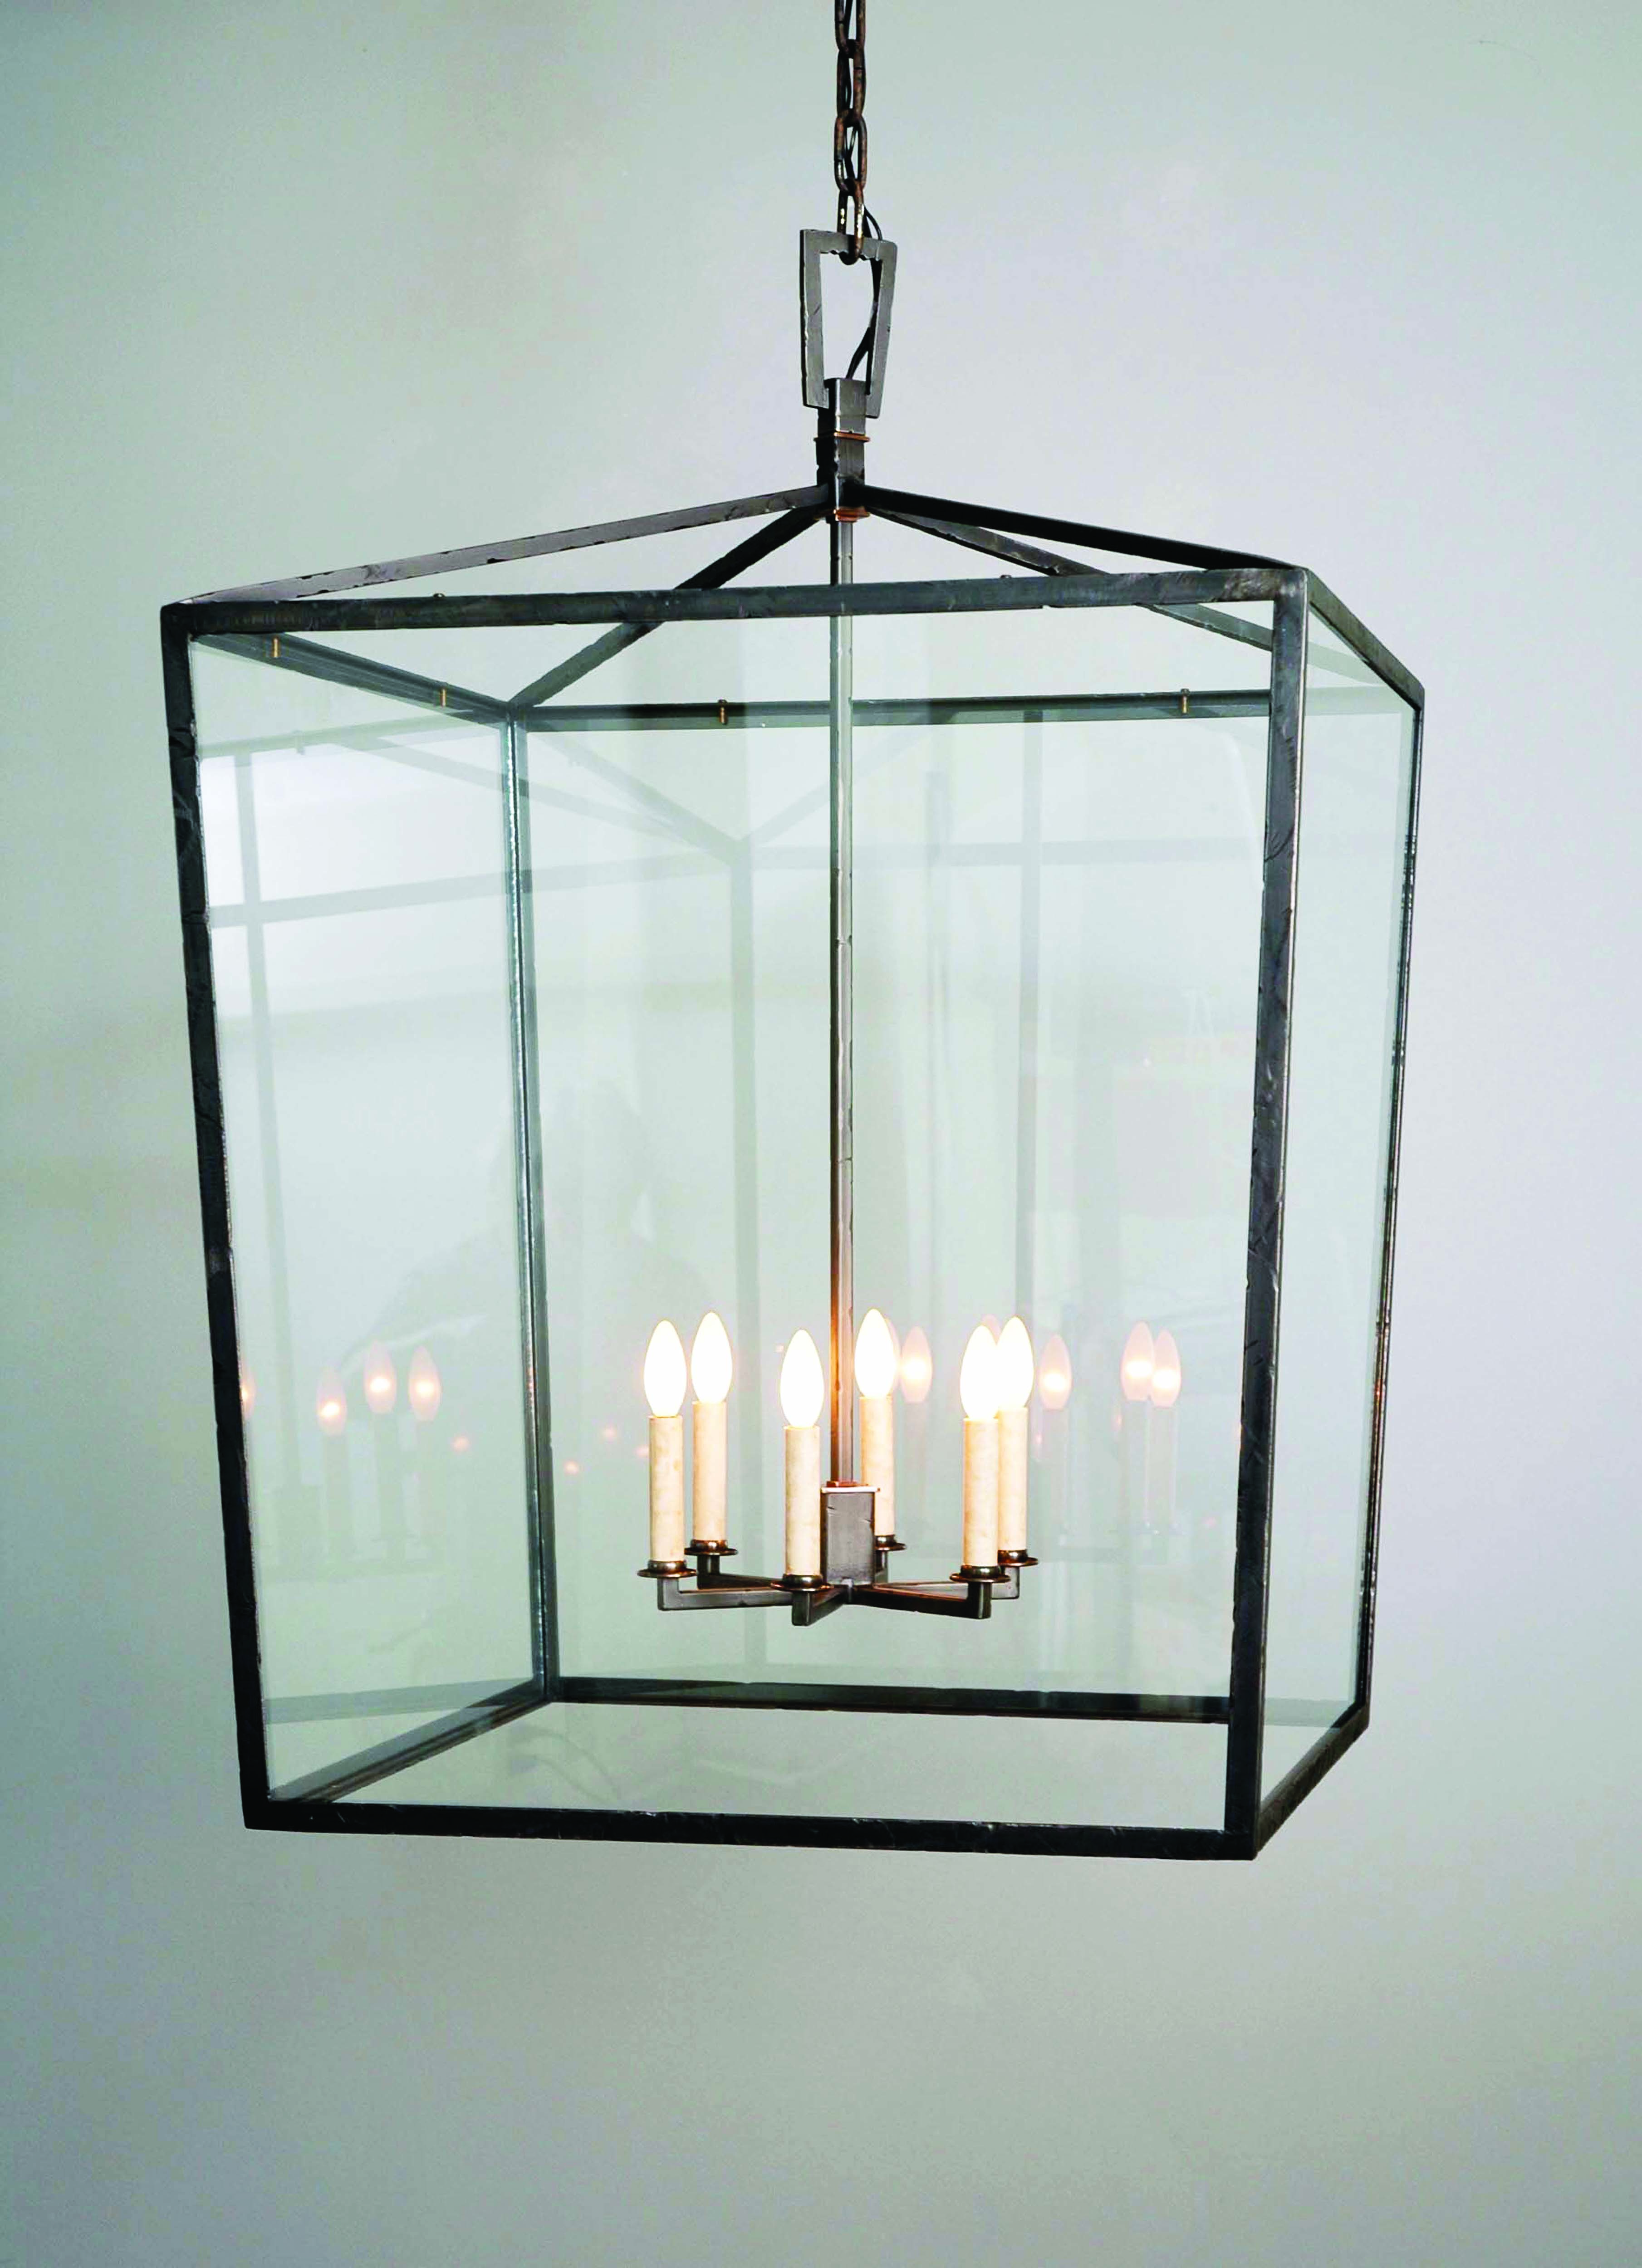 square box cage lantern model no h1340h copper lantern lighting